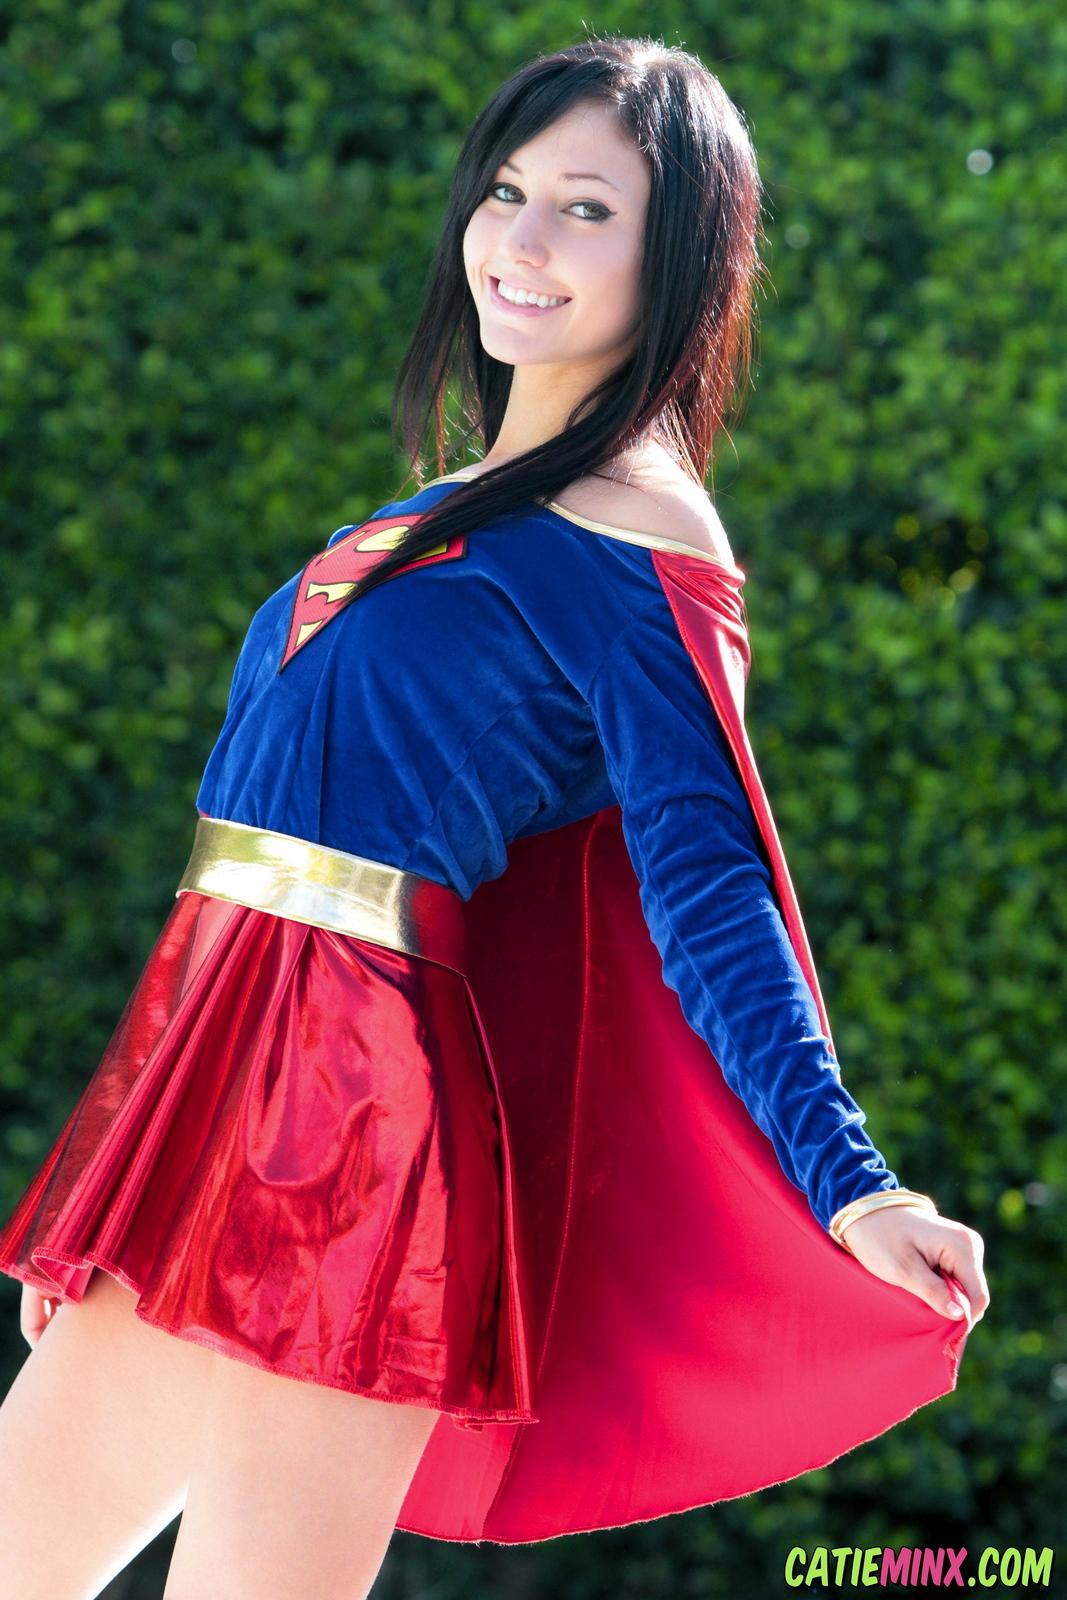 catie-minx-supergirl-costiume-poolside-young-brunette-nude-09